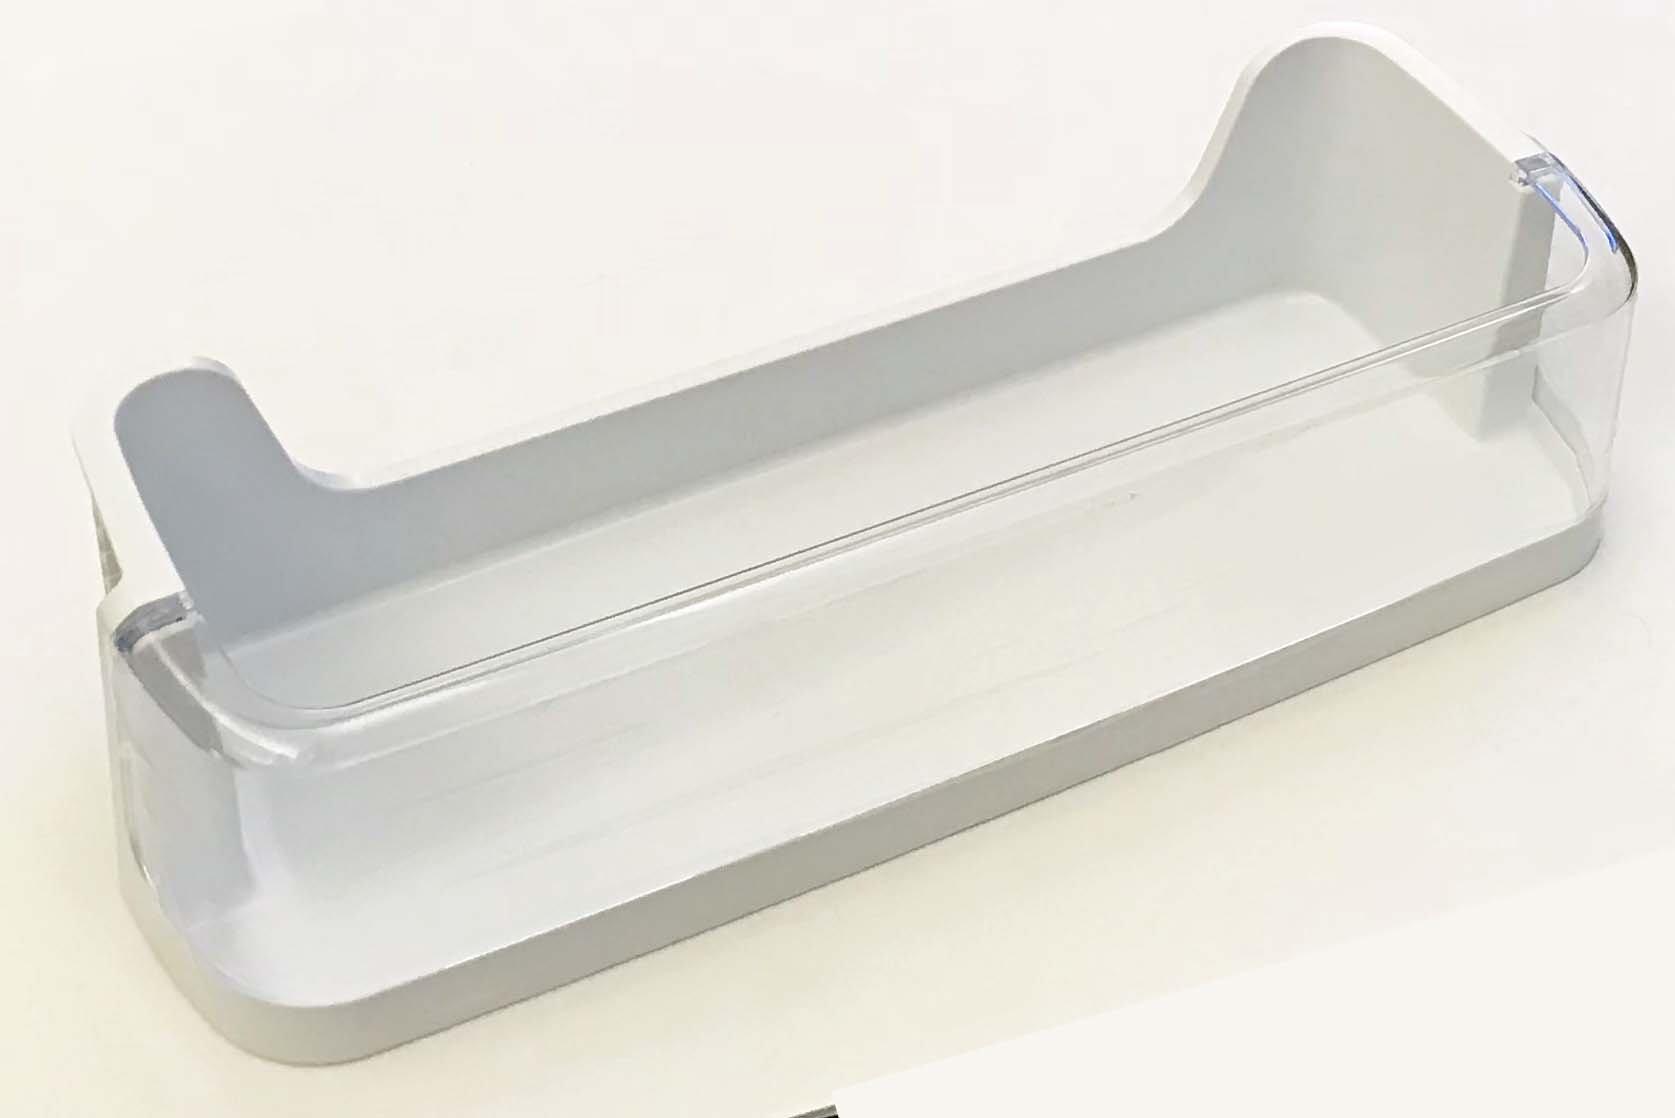 OEM Samsung Refrigerator Door Bin Basket Shelf Tray For Samsung RS265TDWP, RS265TDWP/XAA, RS25H5121WW, RS25H5121WW/AA